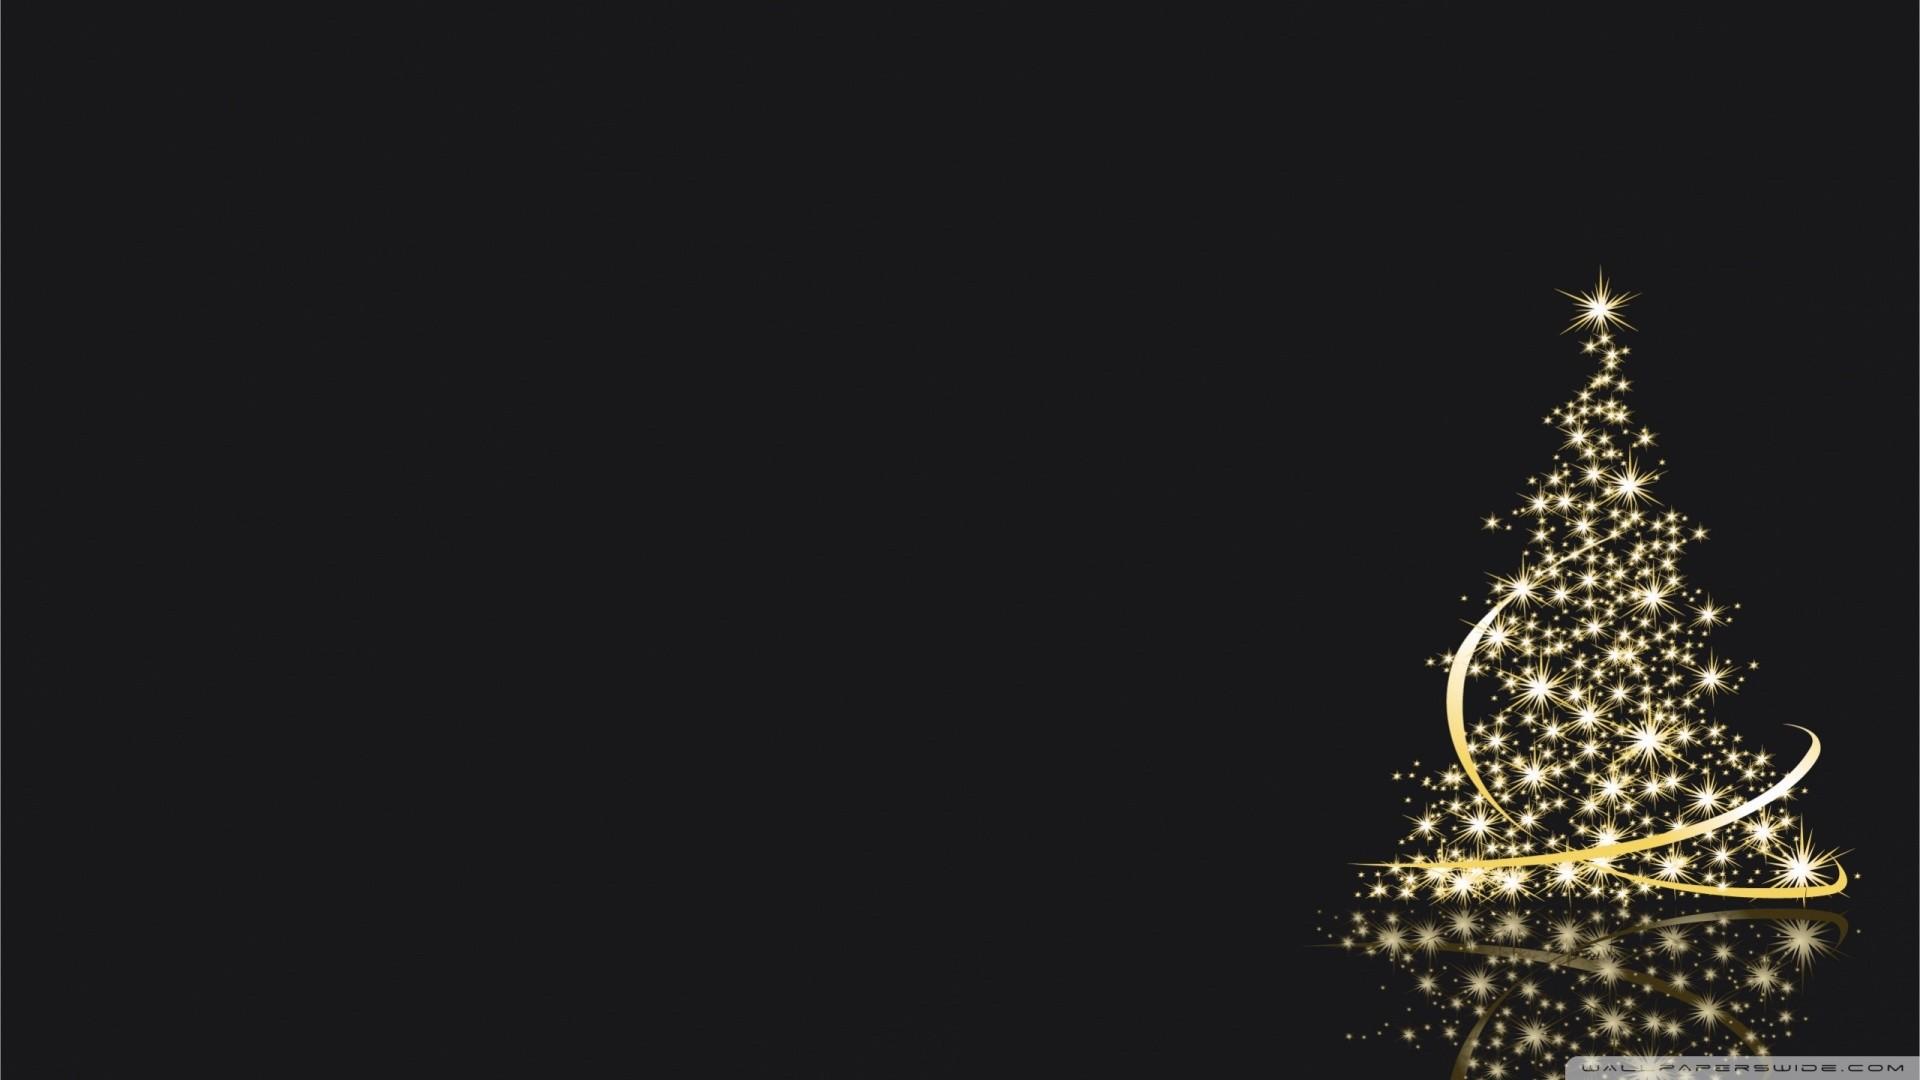 Top 12 Christmas tree Wallpaper and Desktop Backgrounds #9757